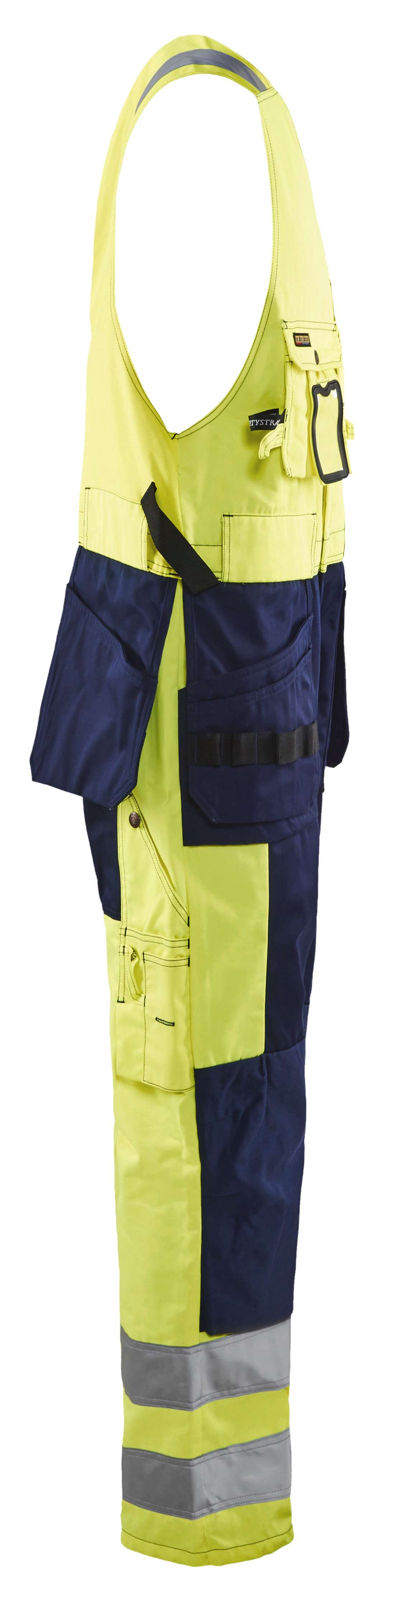 Blaklader Bodybroeken 26531804 High Vis geel-marineblauw(3389)